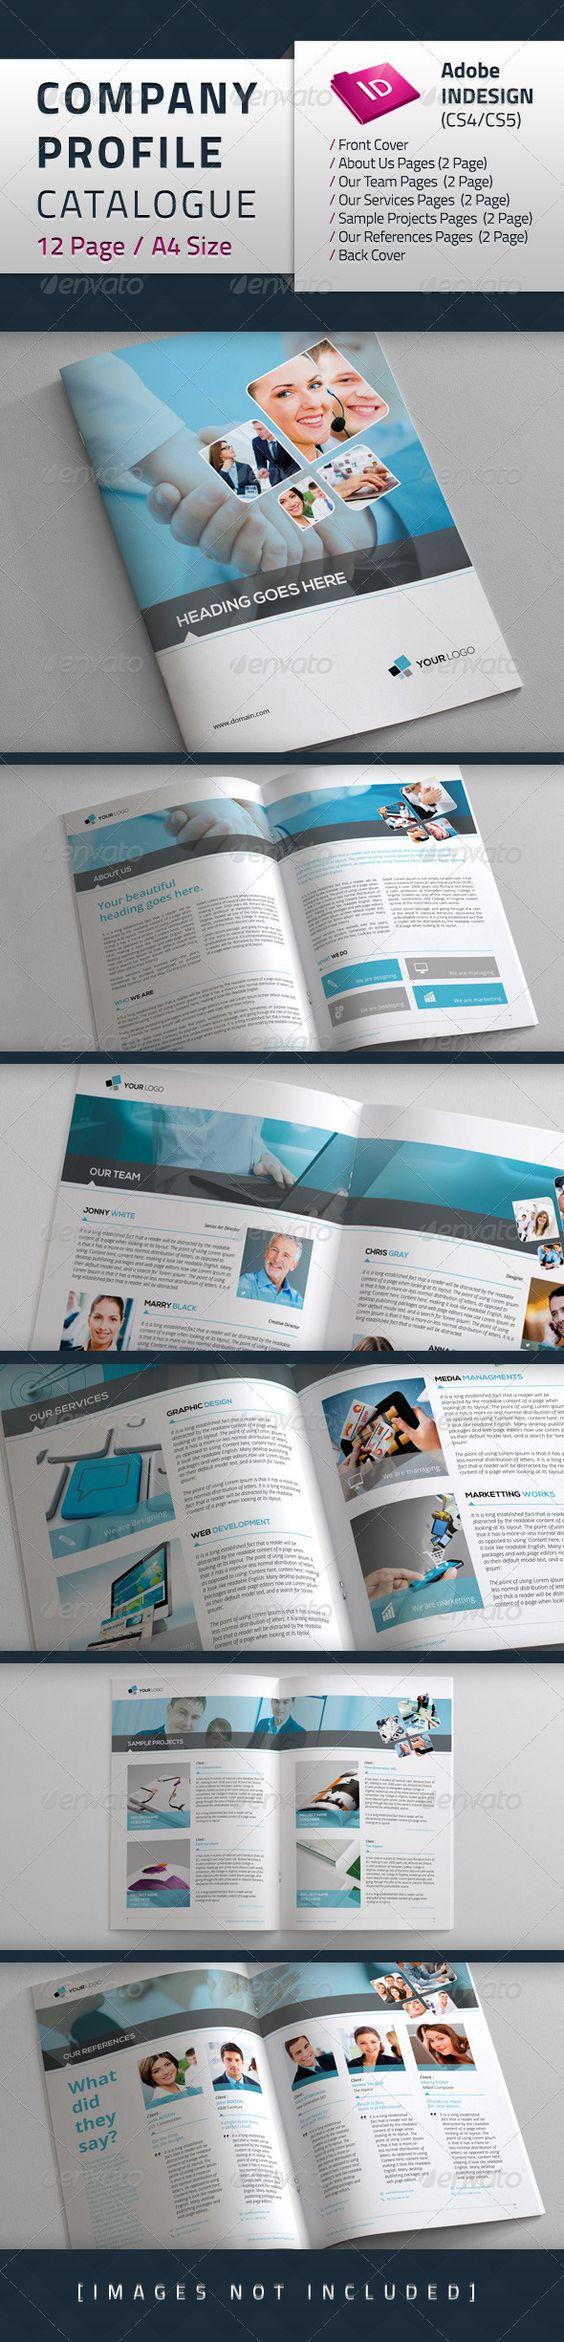 Company Profile Catalogue | Fonts, Creative and Colors